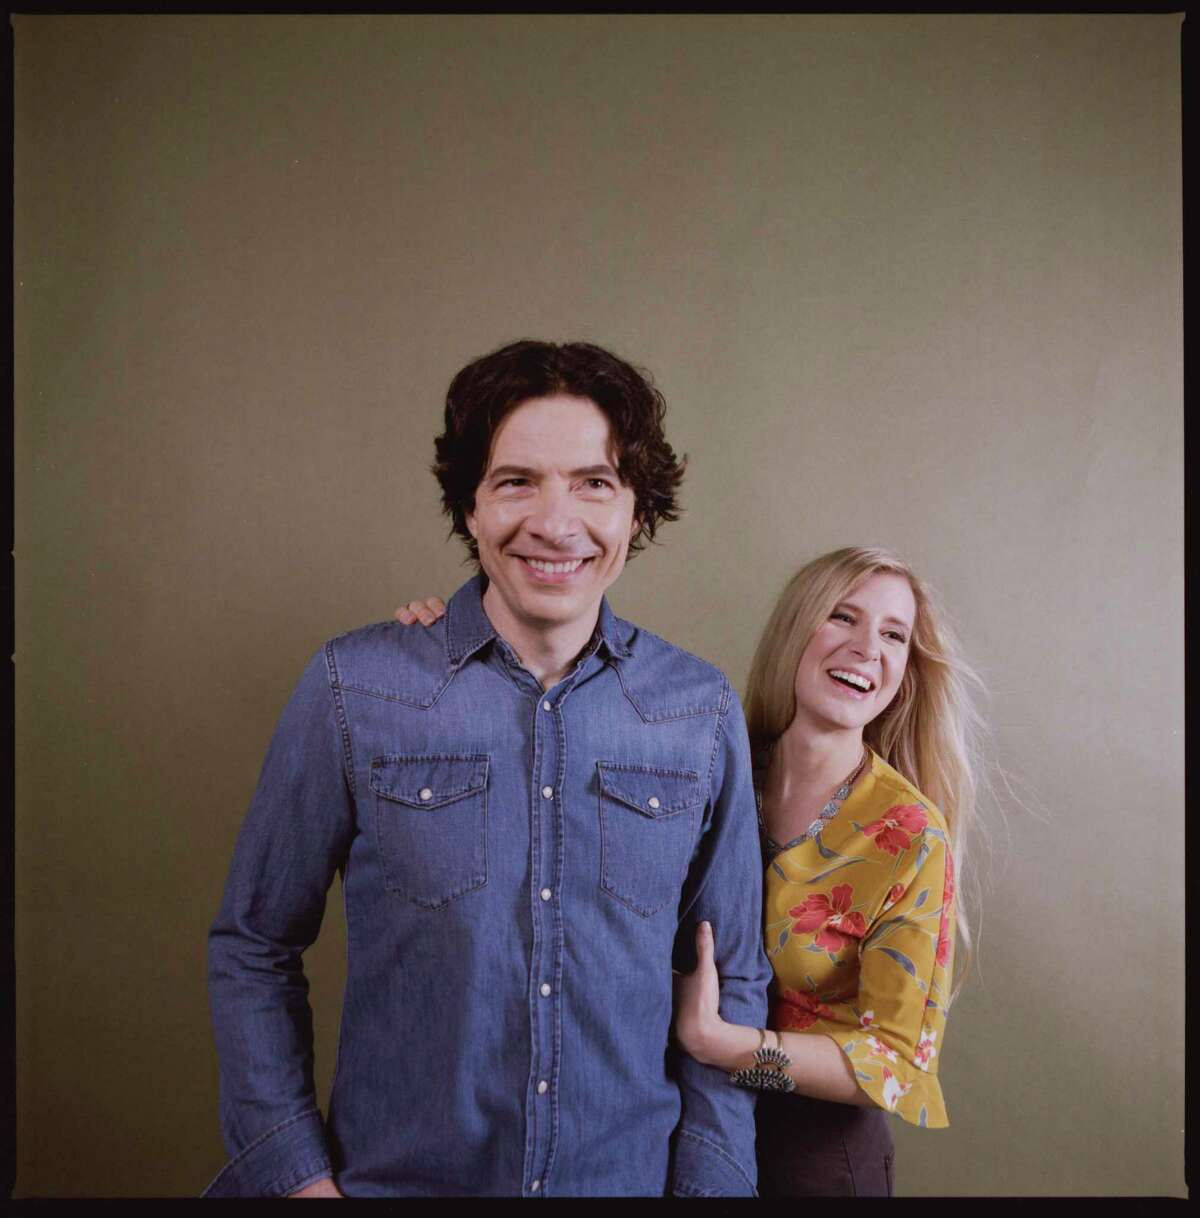 AJ Swearingen and Jayne Kelli will do the music of Simon and Garfunkel.